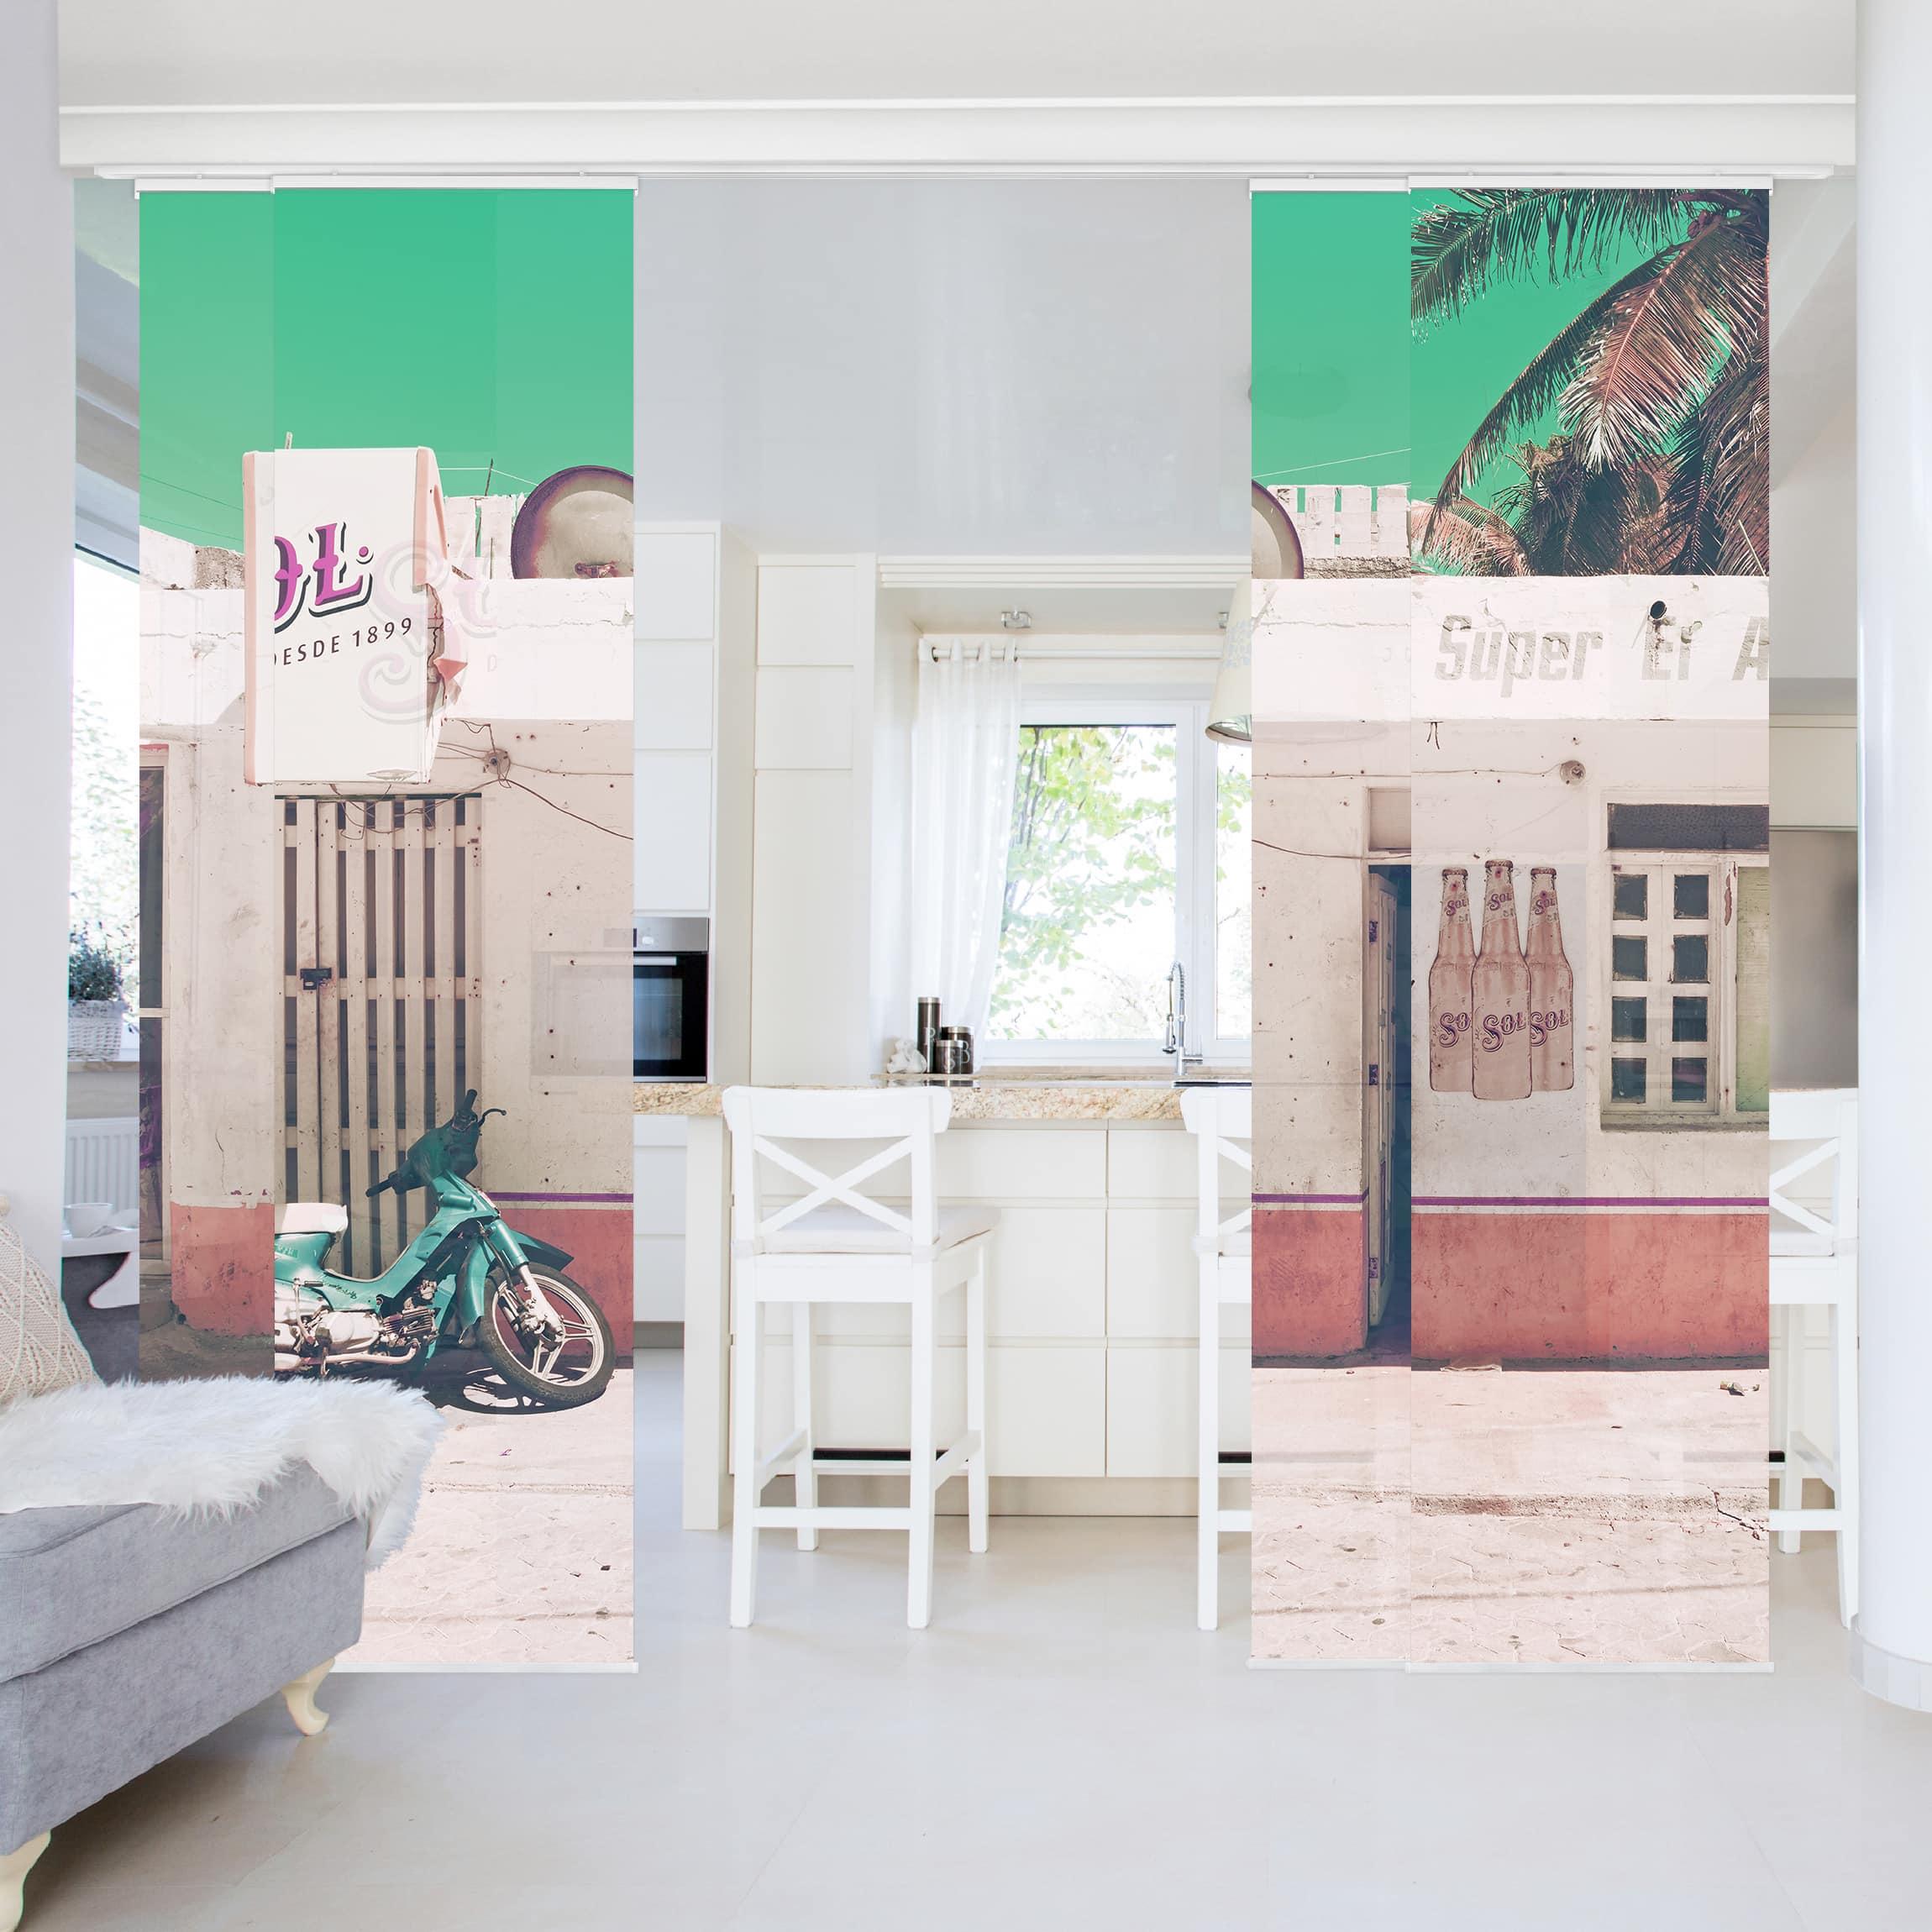 schiebegardinen set mini supermarkt vintage 4 fl chenvorh nge. Black Bedroom Furniture Sets. Home Design Ideas